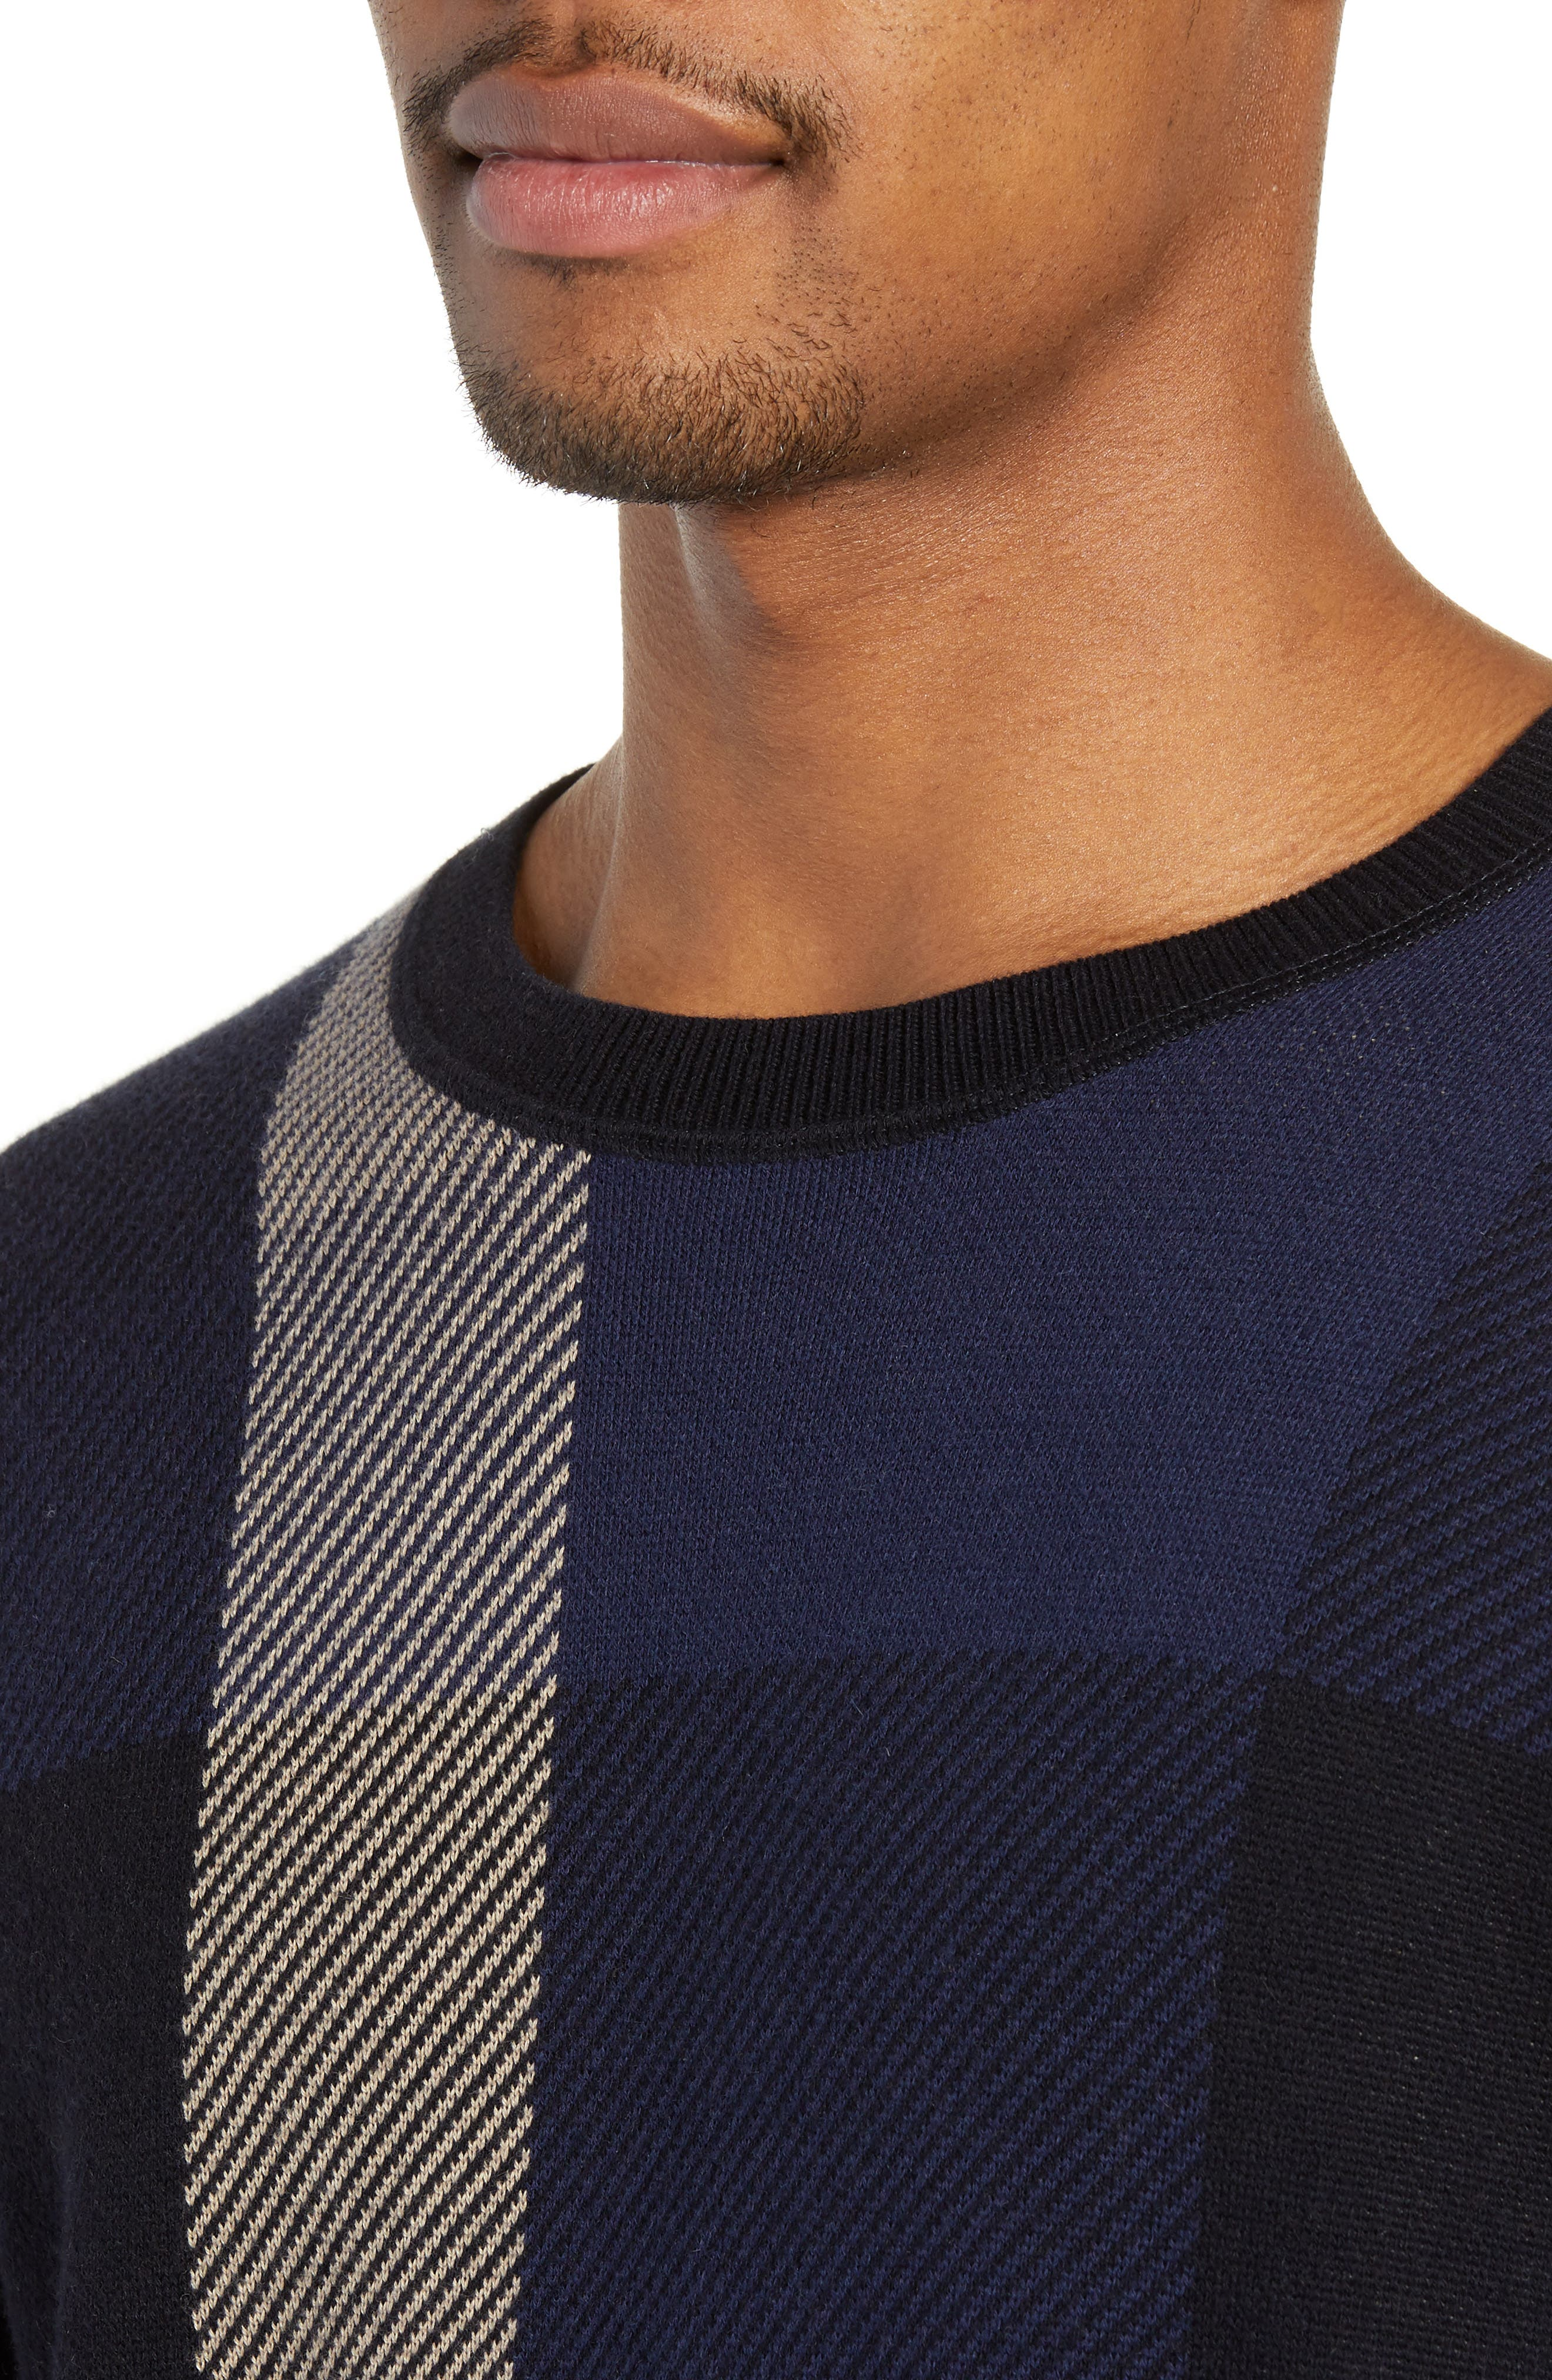 Marshall Crewneck Sweater,                             Alternate thumbnail 4, color,                             NAVY